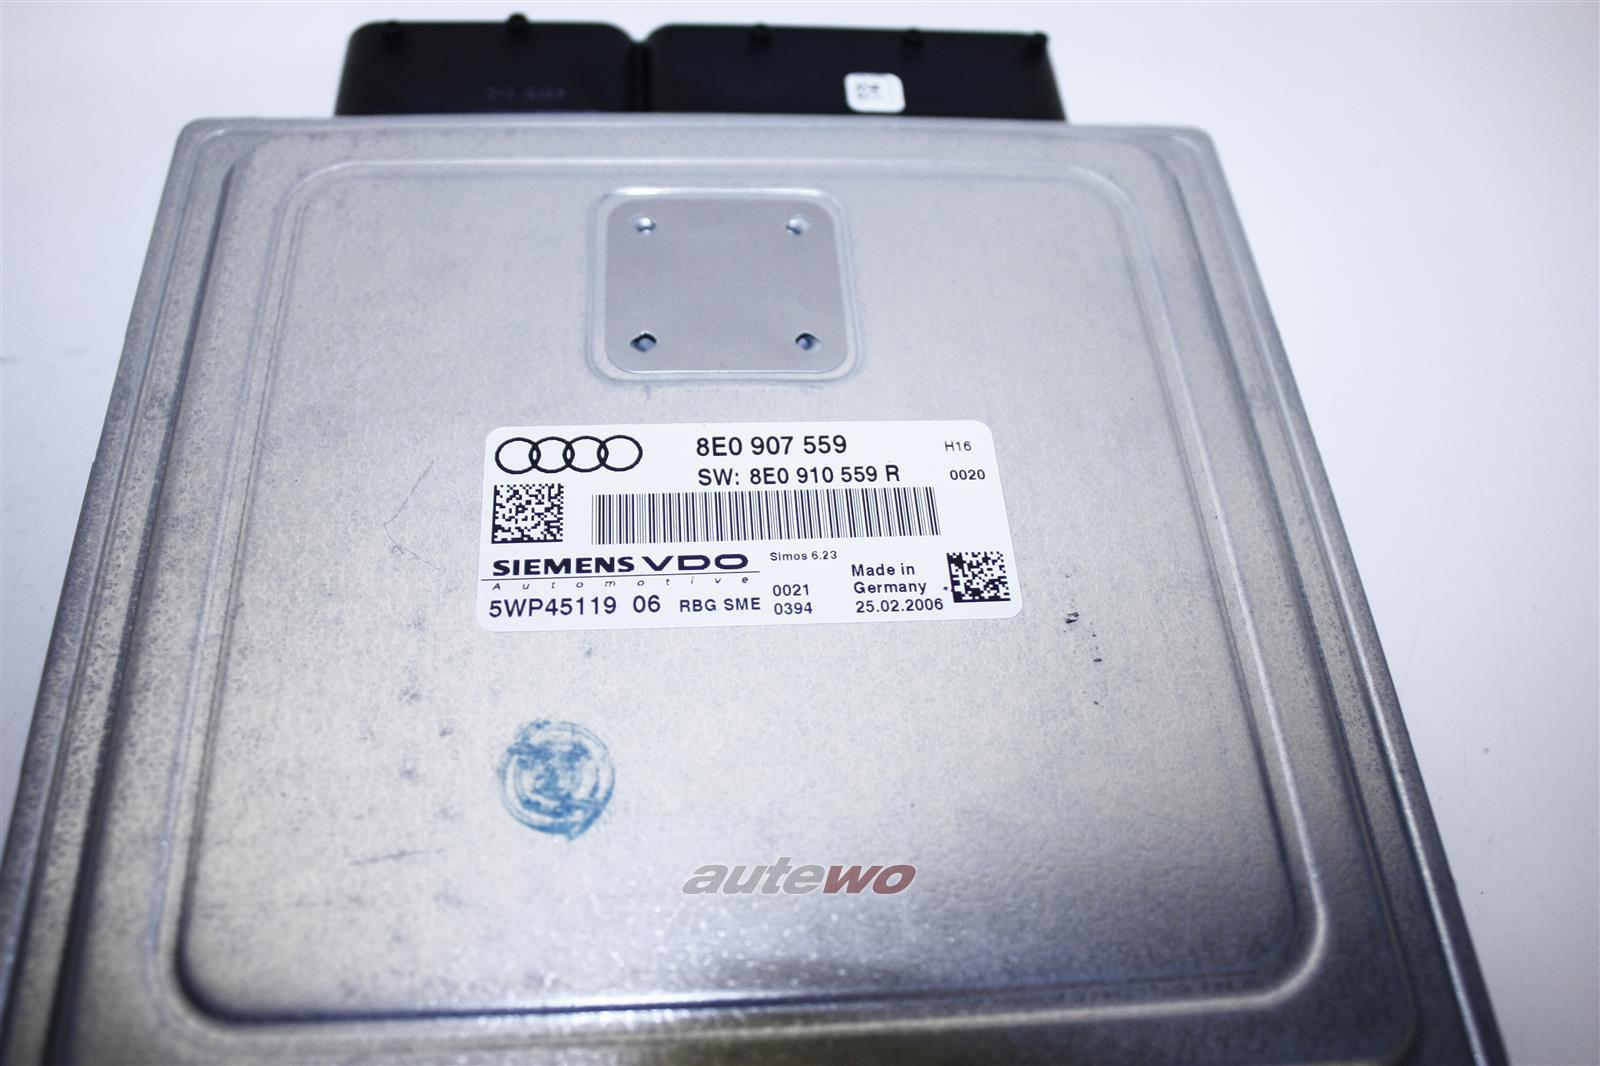 8E1910559AX 8E0910559RX NEU Audi A4 8E/A4 8H Cabrio 3.2l FSI Motorsteuergerät